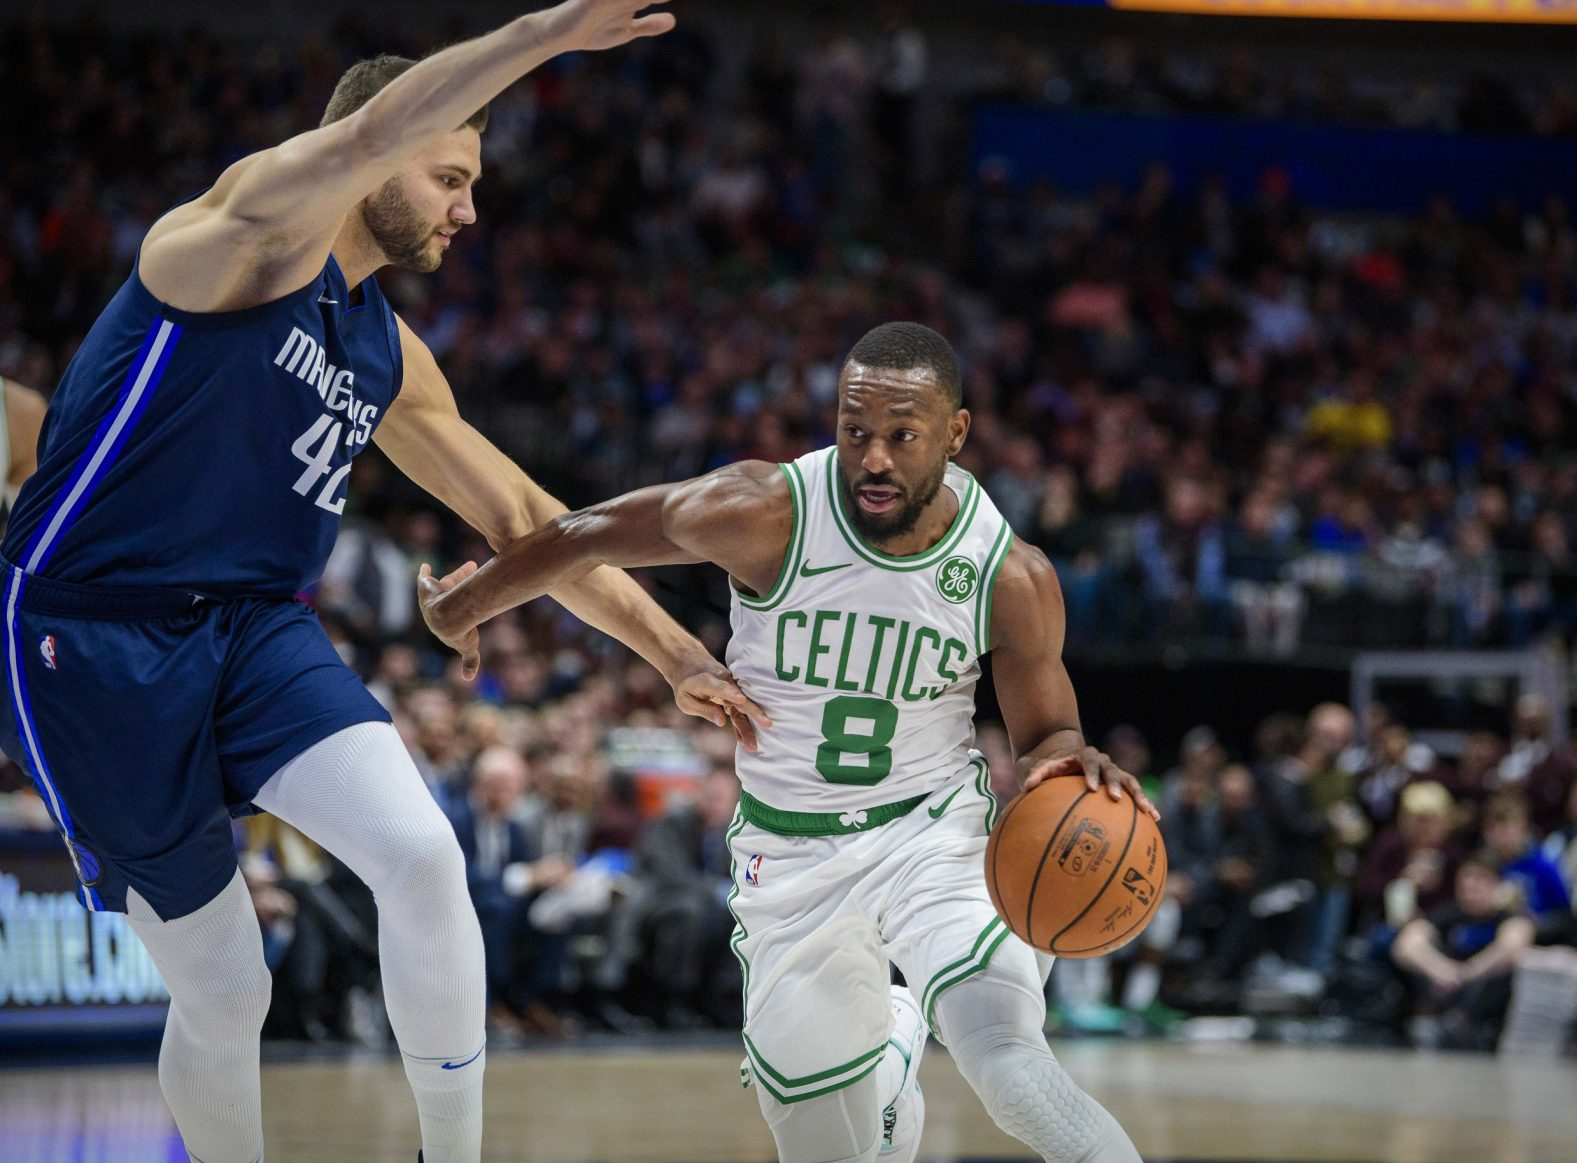 Rapid Recap: Cardiac Kemba bookends Celtics win over Mavericks